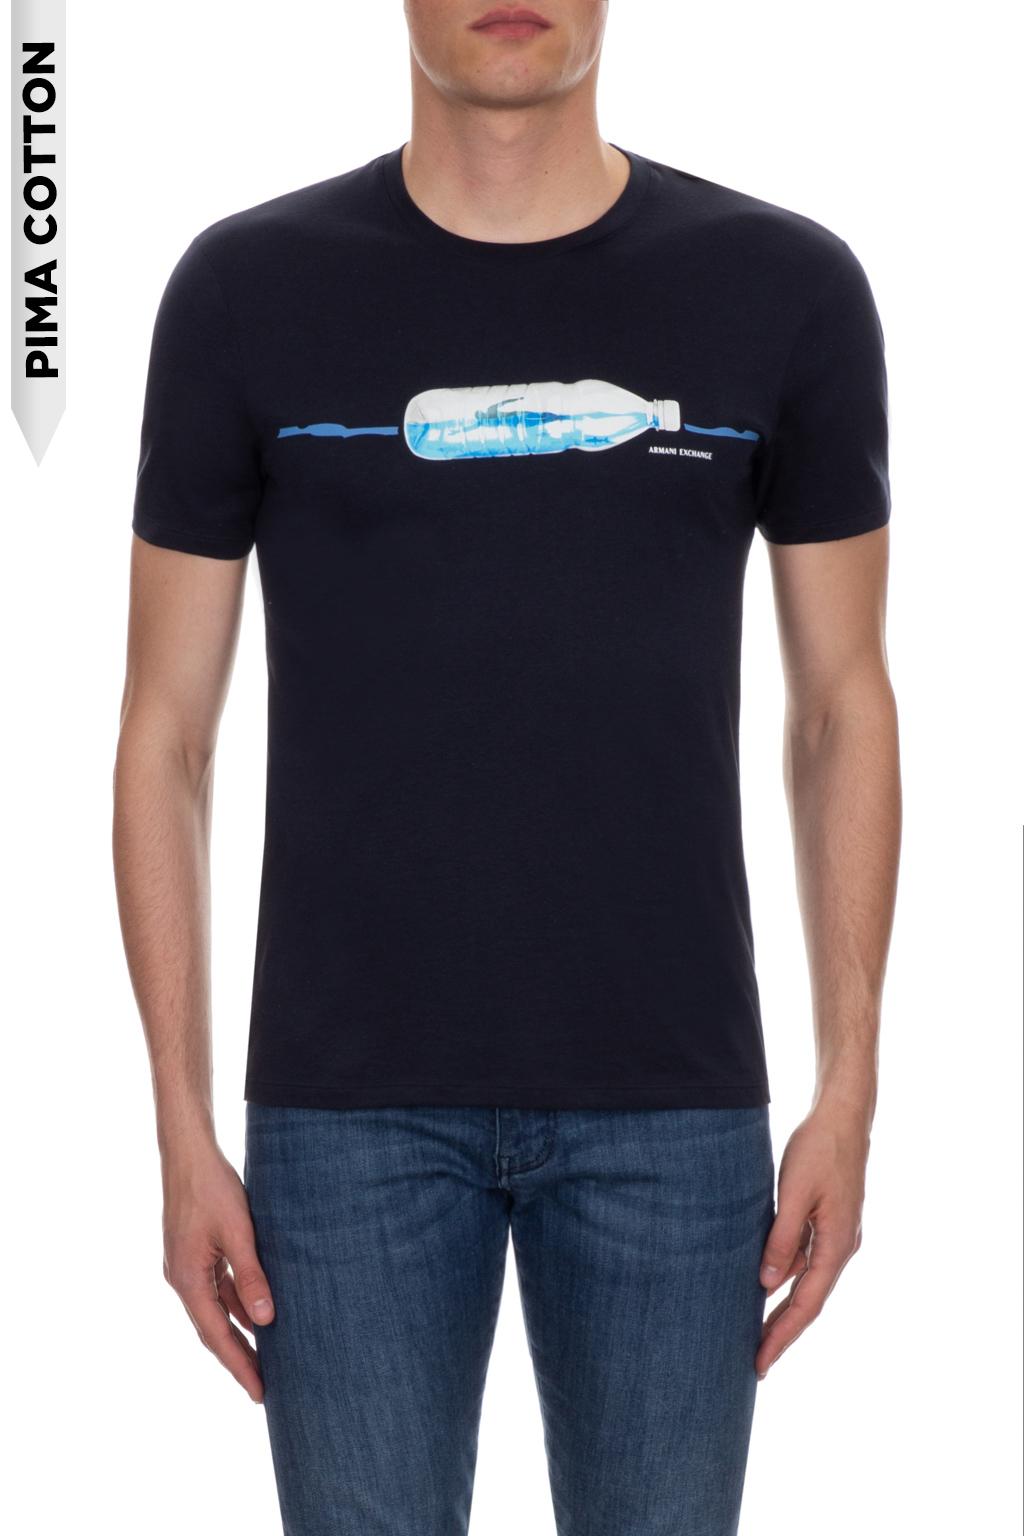 T-shirt uomo bottiglia riciclo ARMANI EXCHANGE